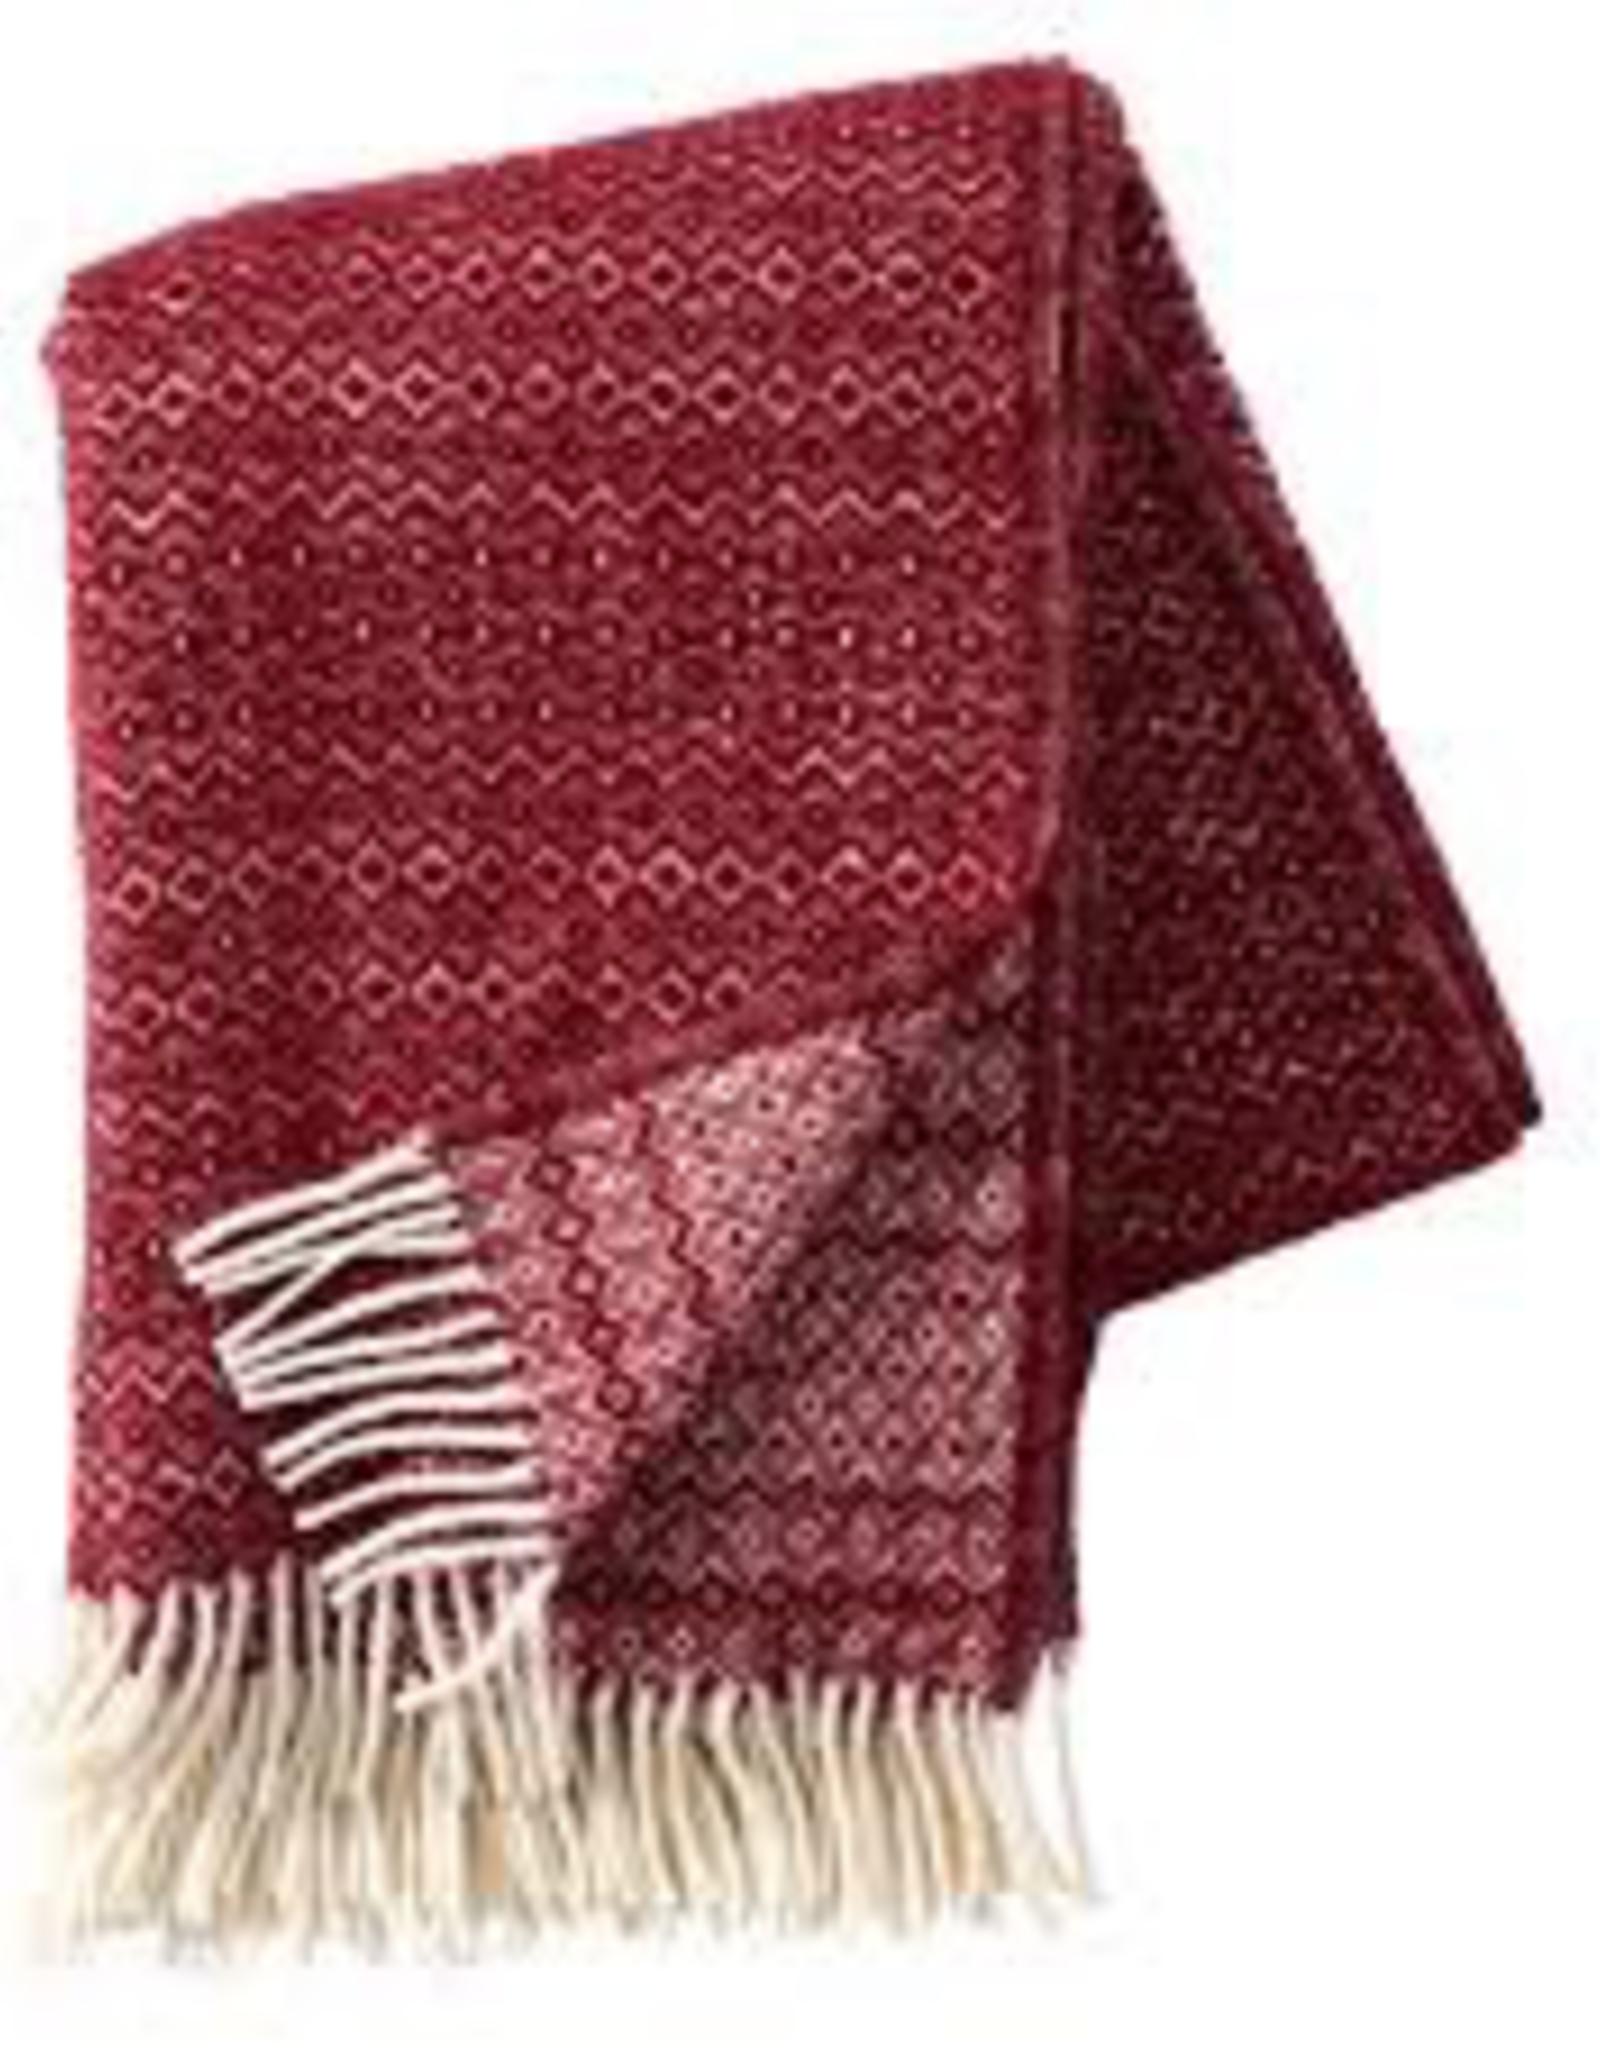 Hekla Throw Bordeaux - 100% Eco Lambs Wool